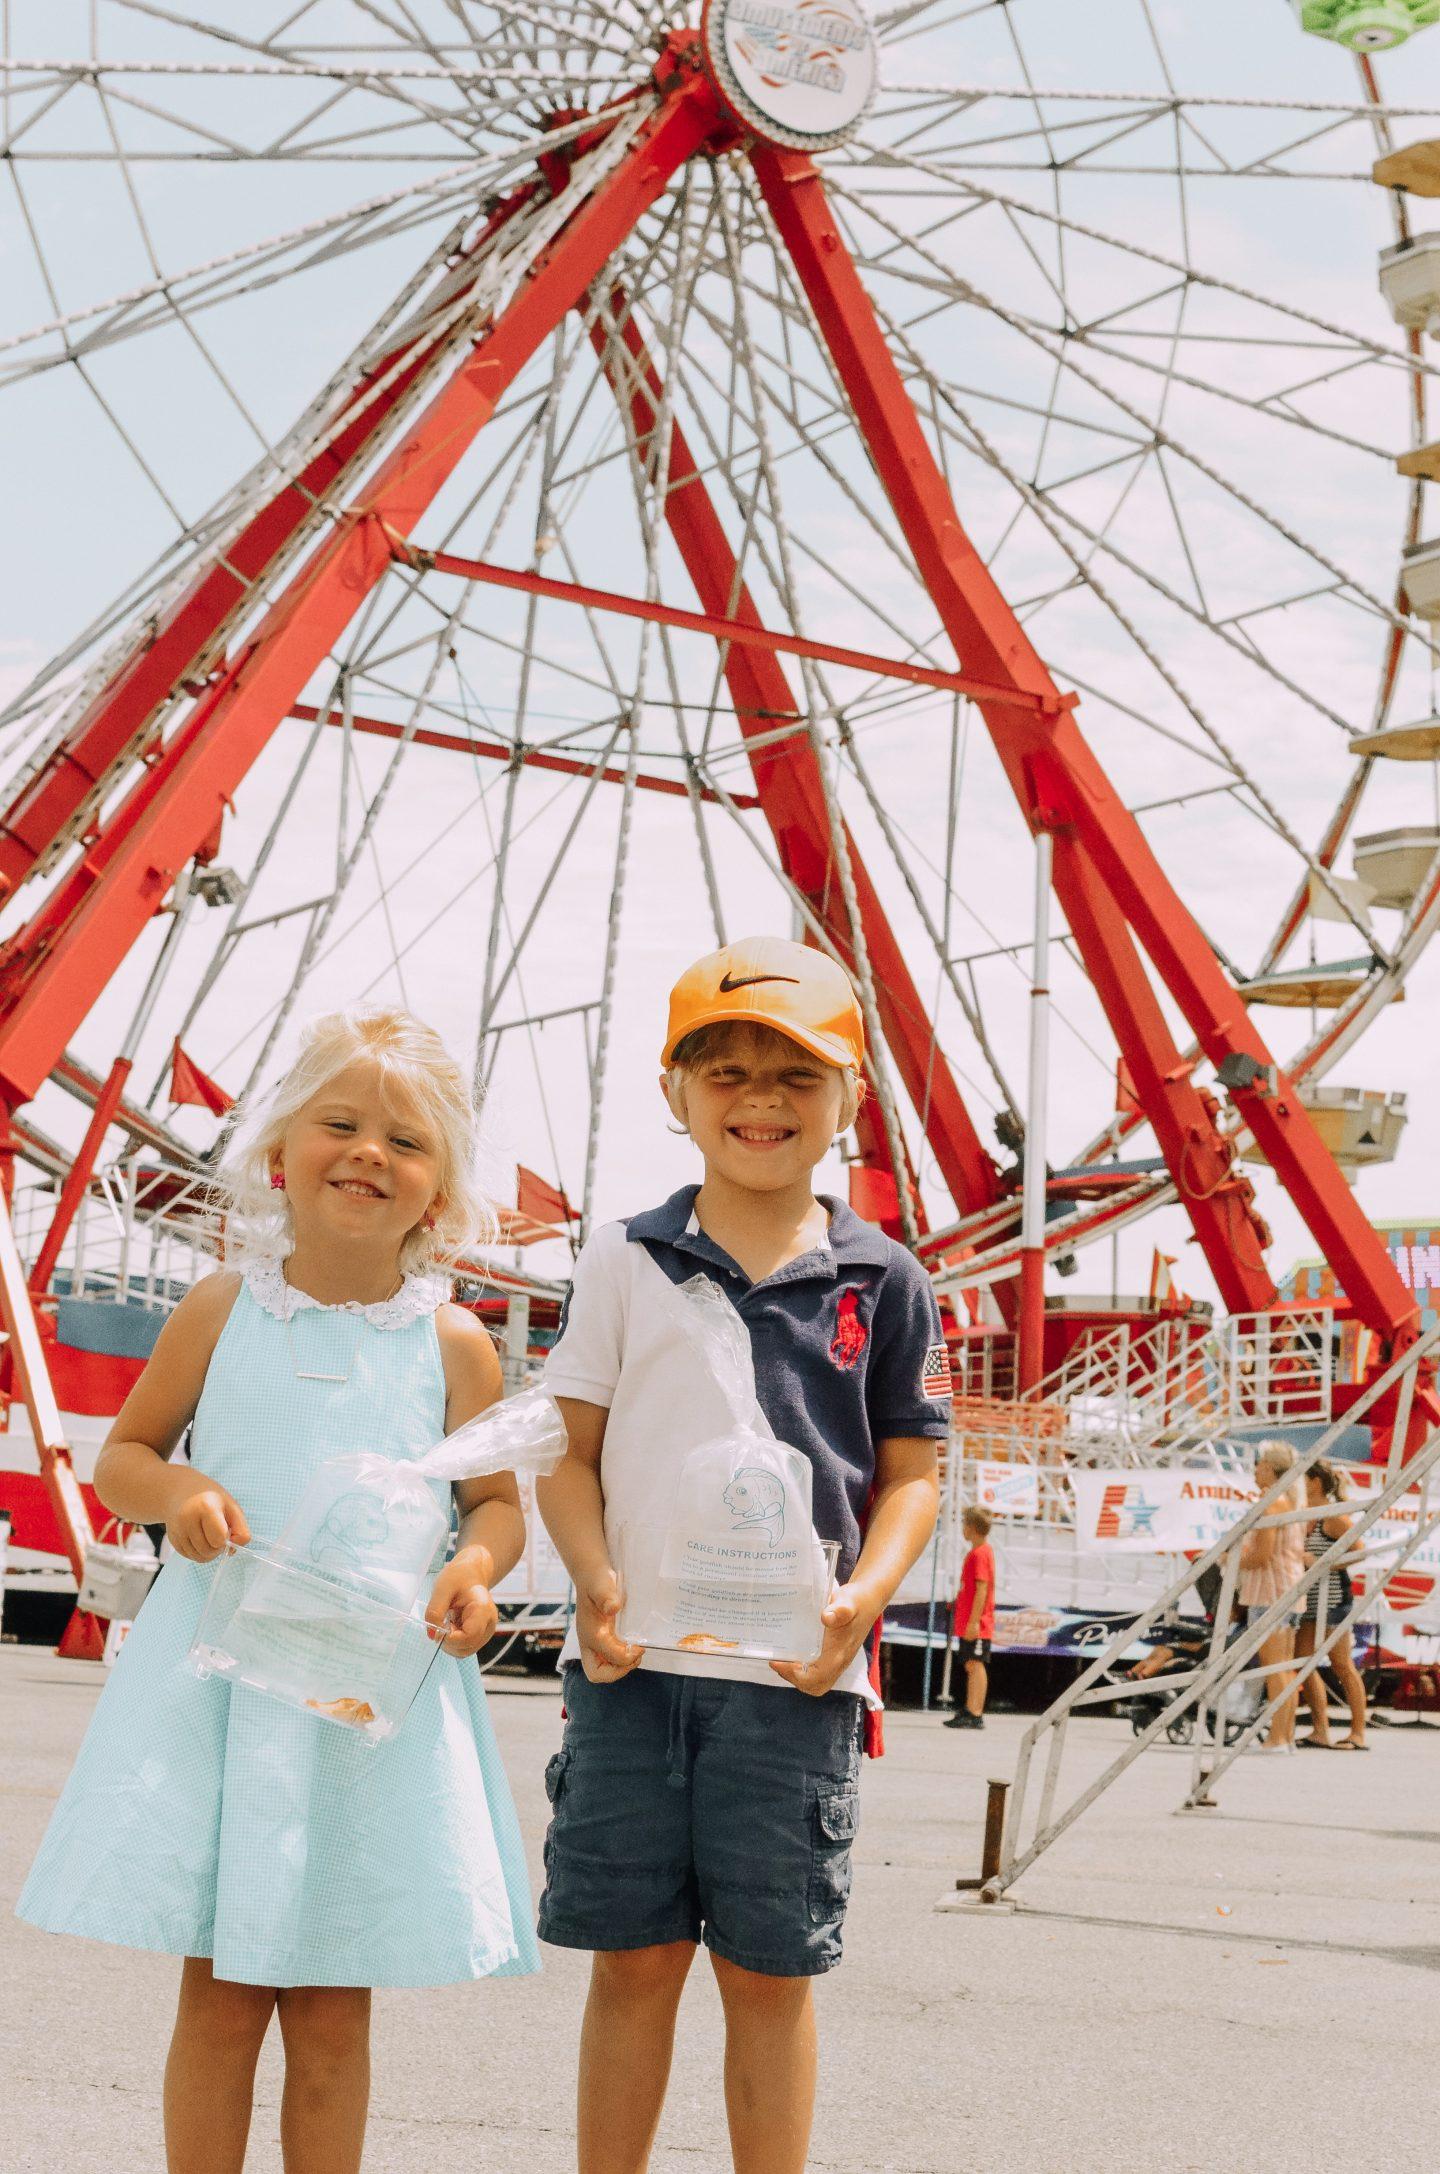 A Family Af {Fair} at the Ohio State Fair